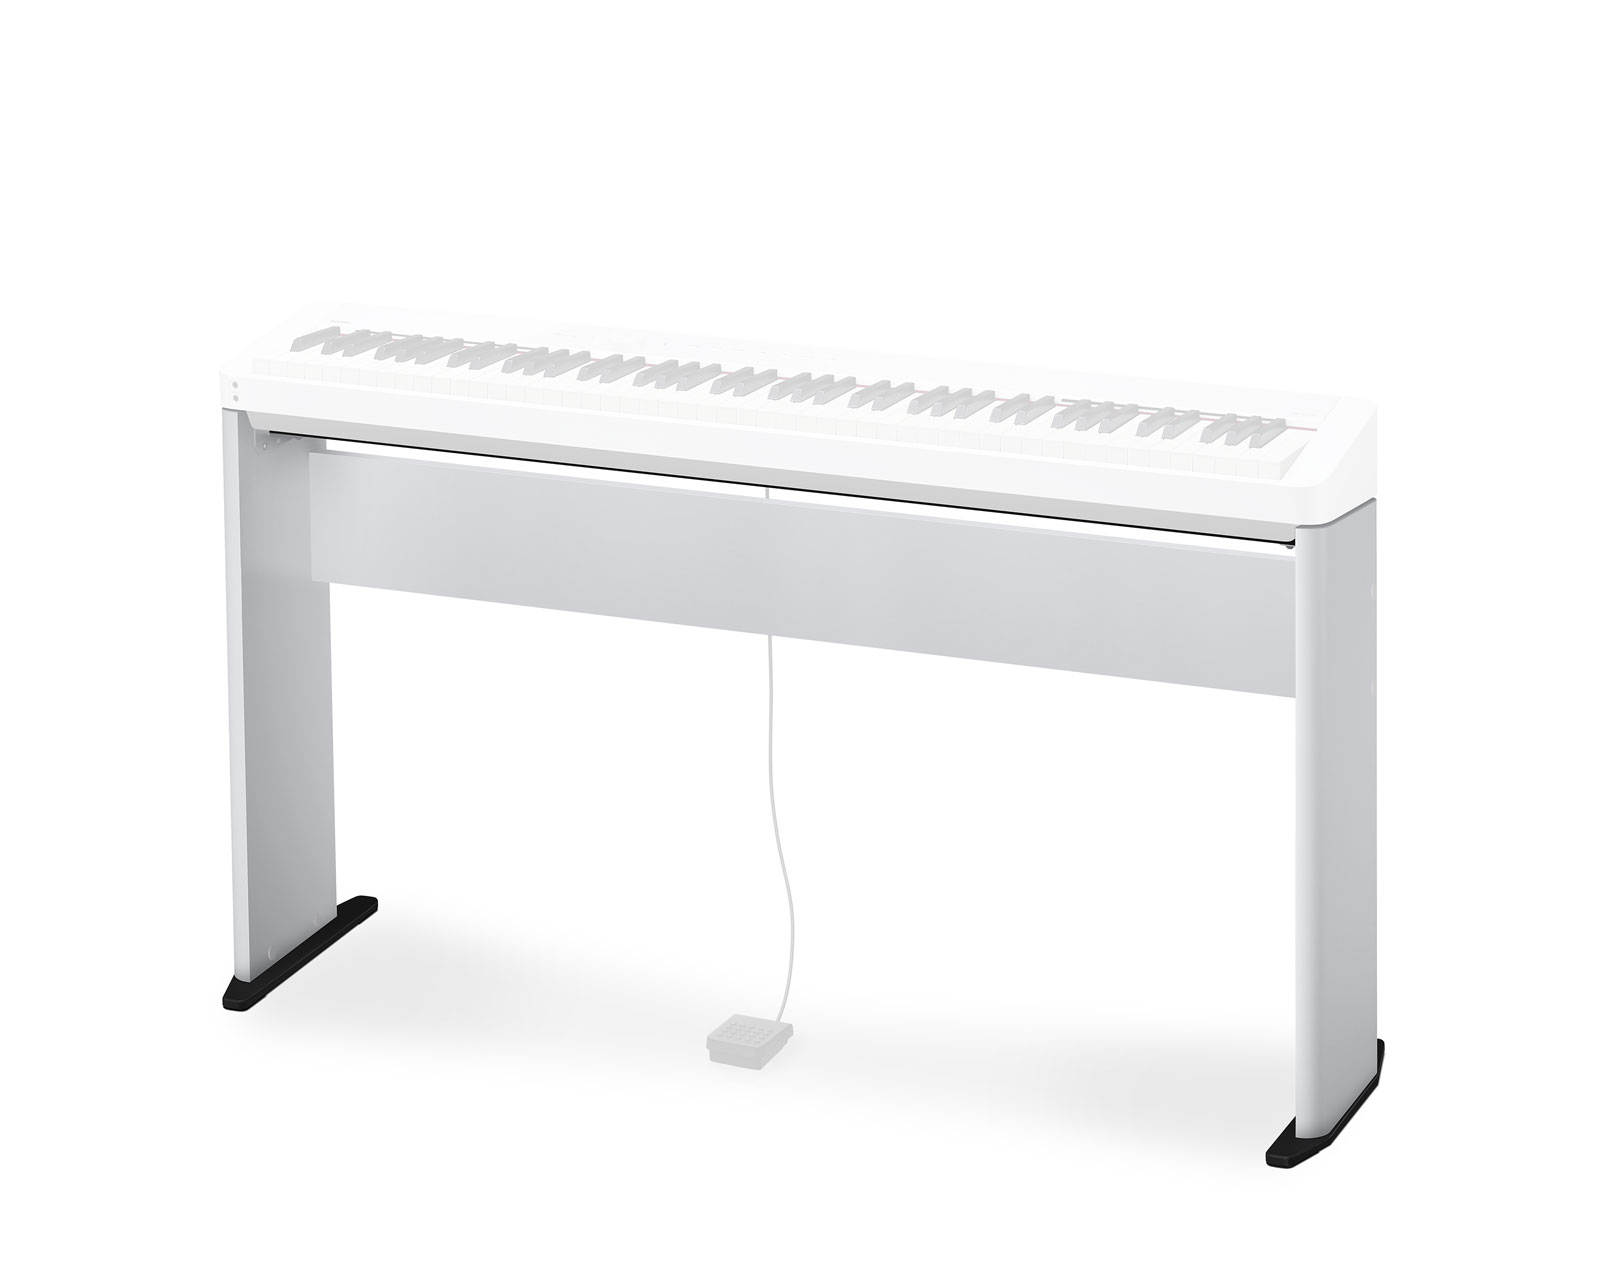 Casio Cs-68 Blanc - Stand Pour Px-s